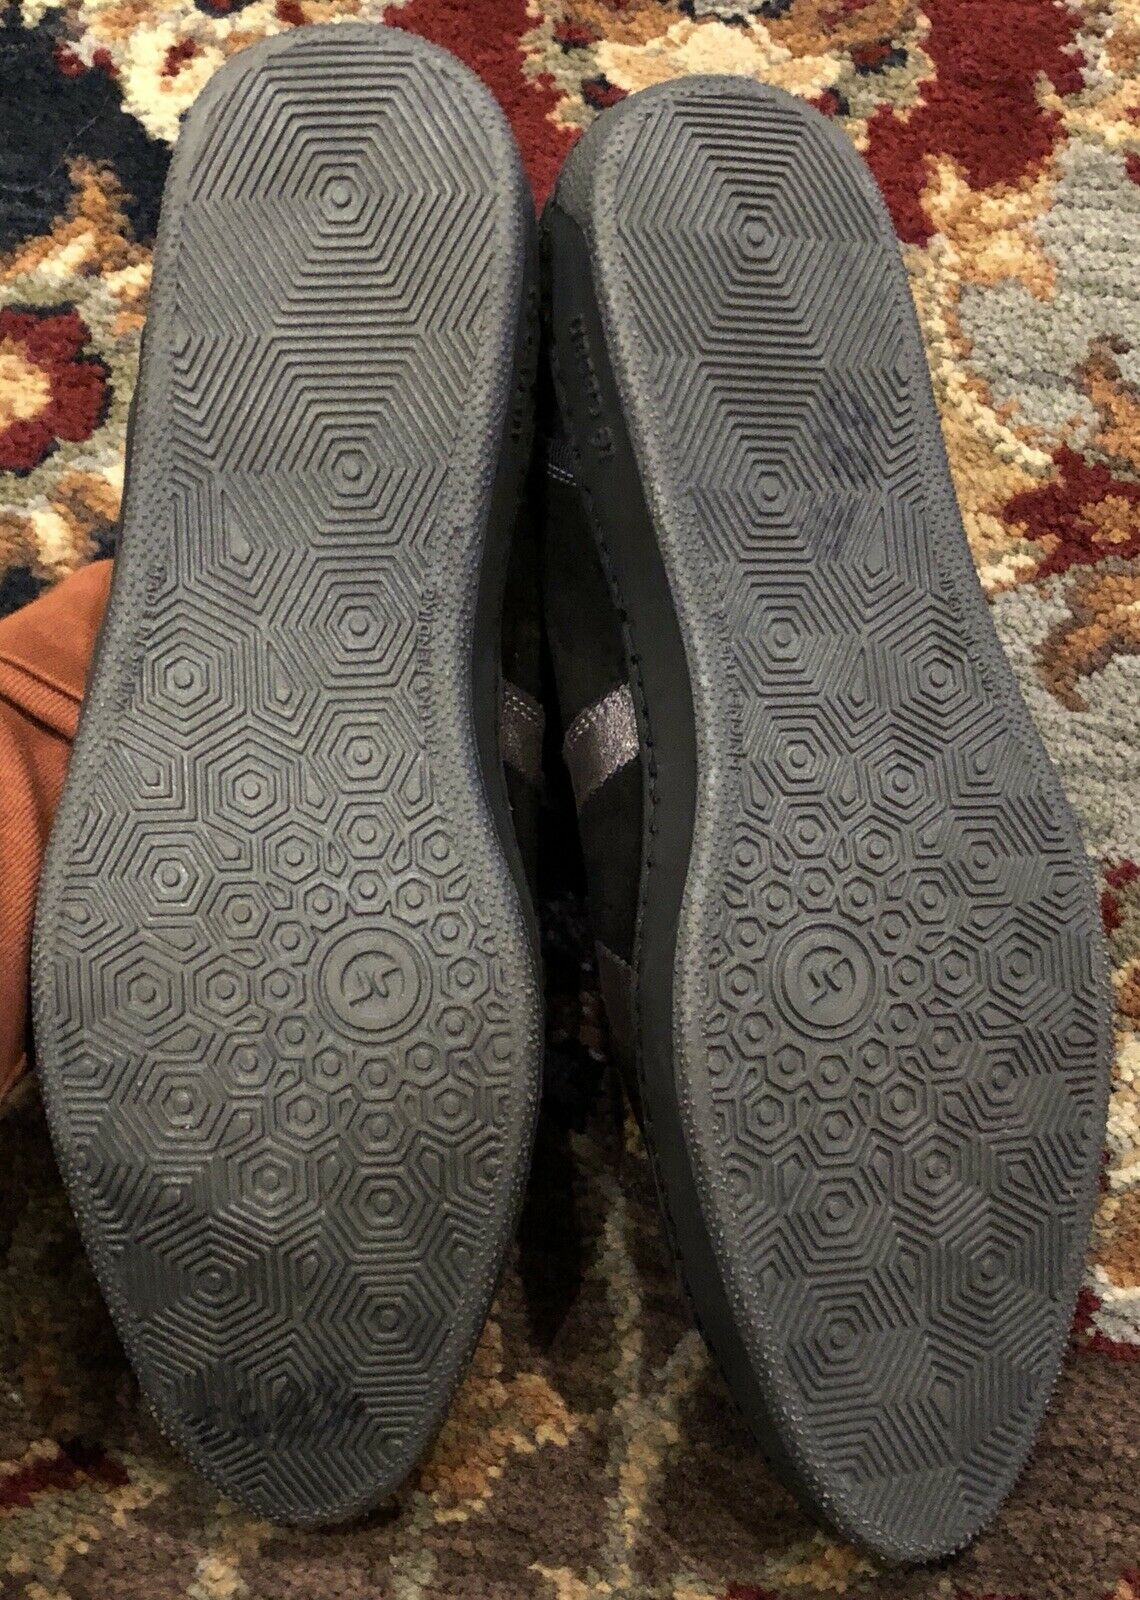 TE CASAN Limited Edition 5 100 nero pewter leather suede suede suede scarpe da ginnastica scarpe 38 8 e17b28